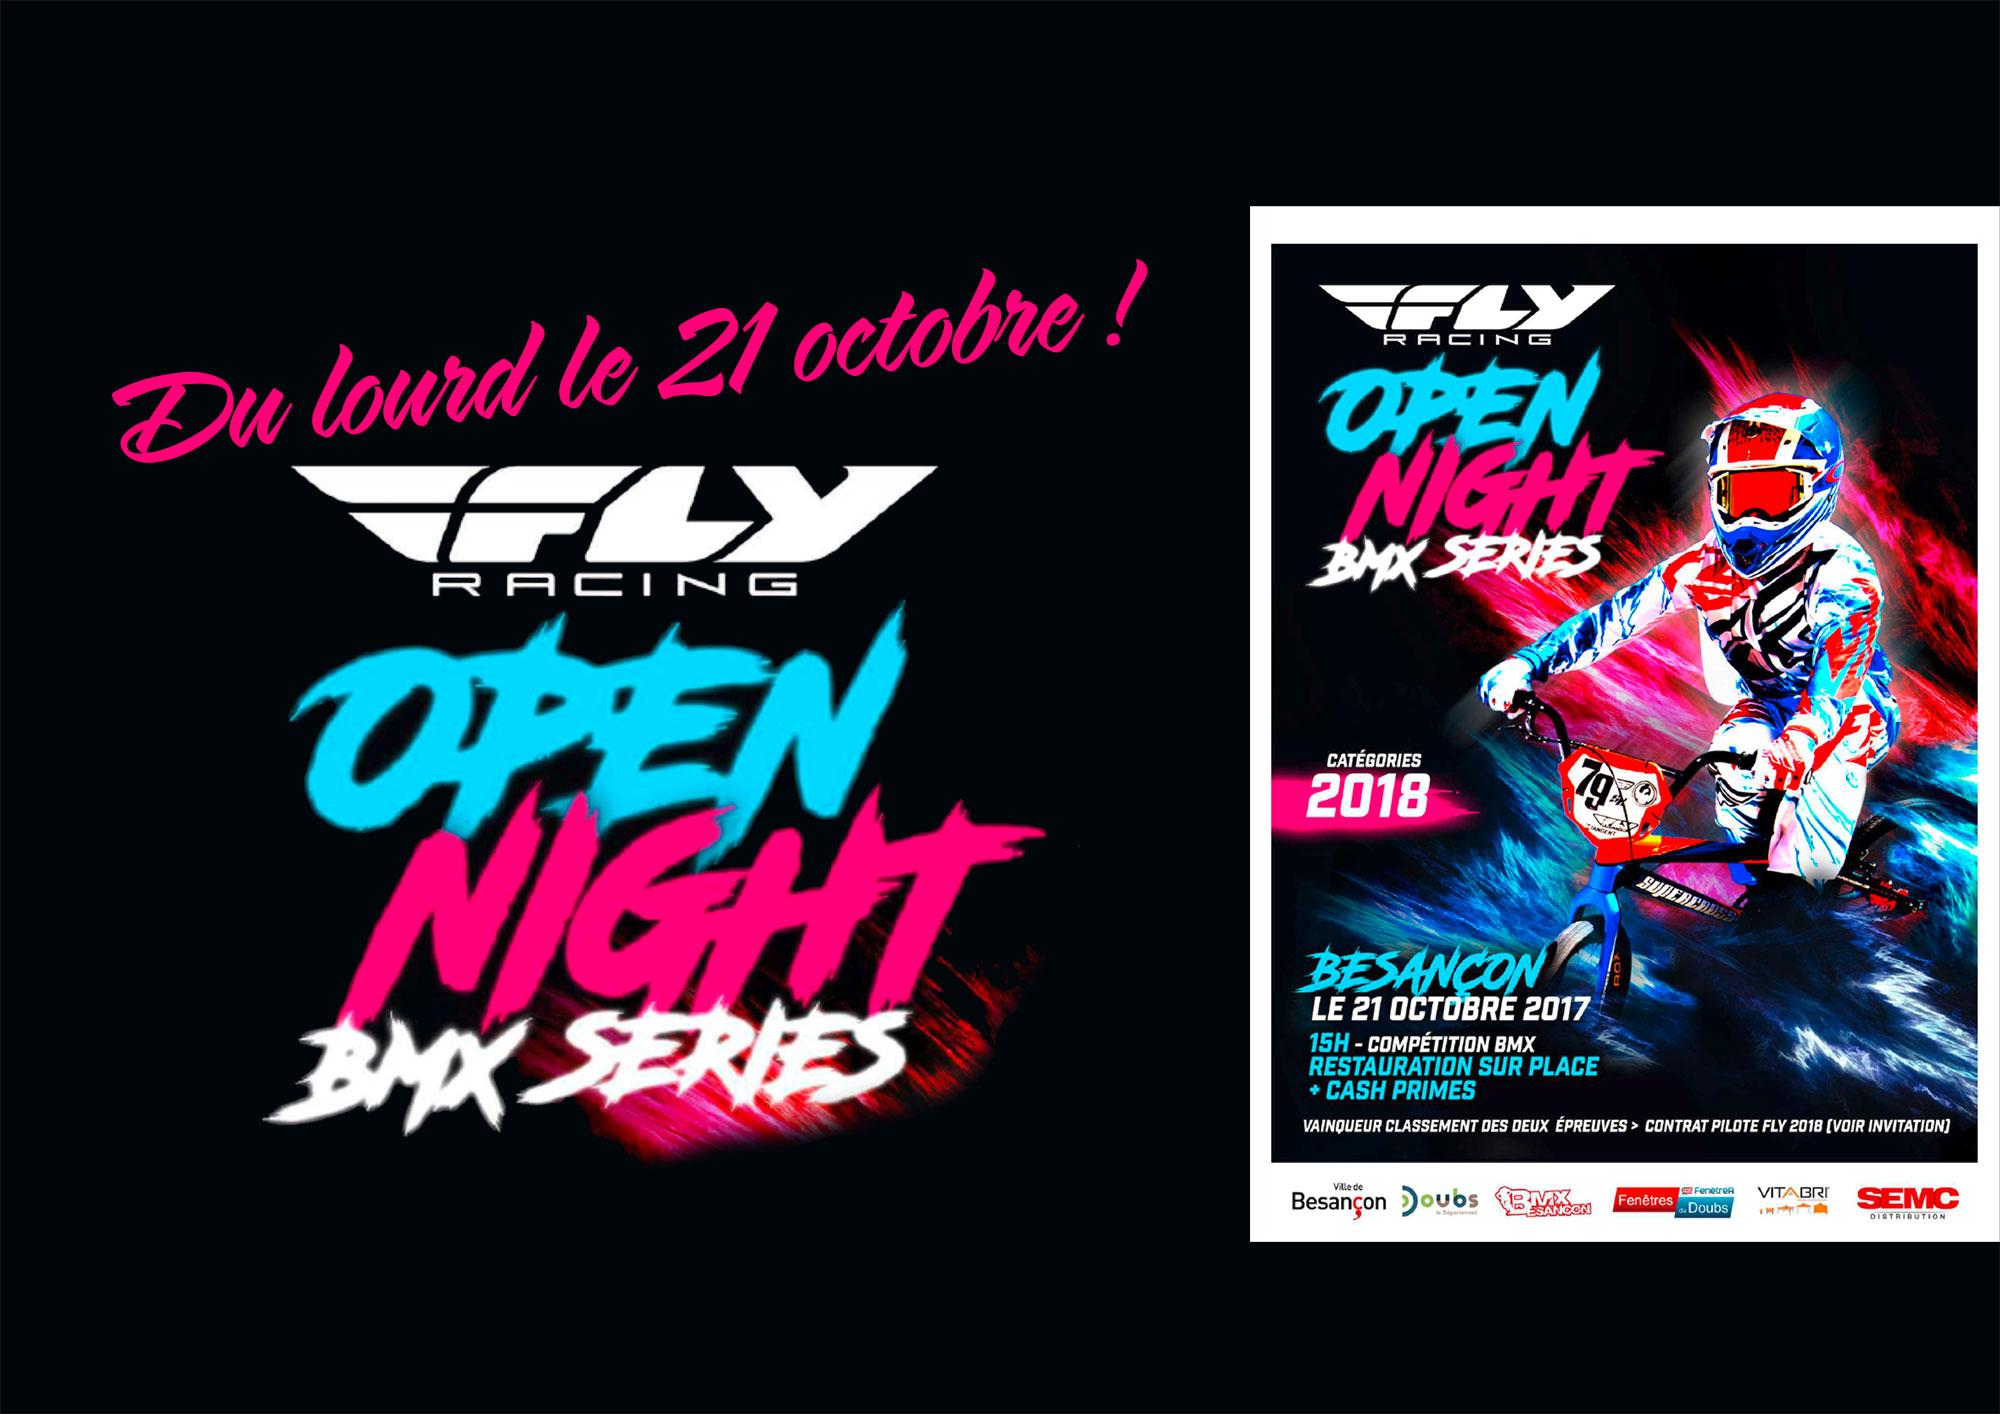 10ème Open Night FLY Series/Dossier d'invitation